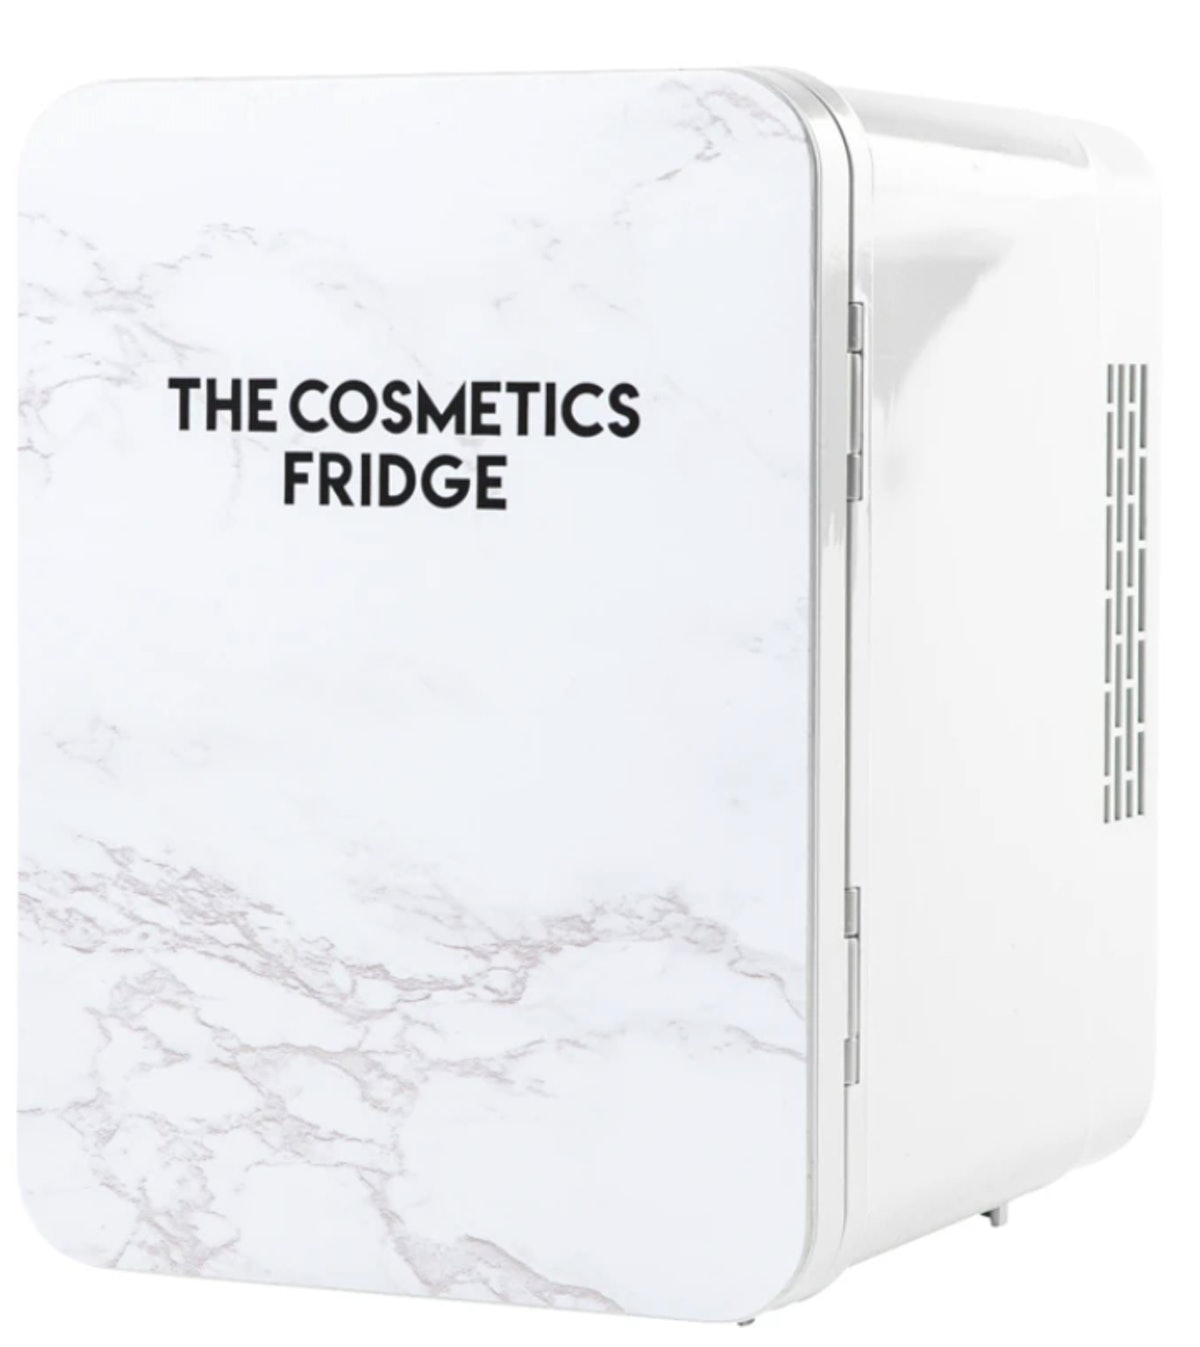 The Marble Cosmetics Fridge